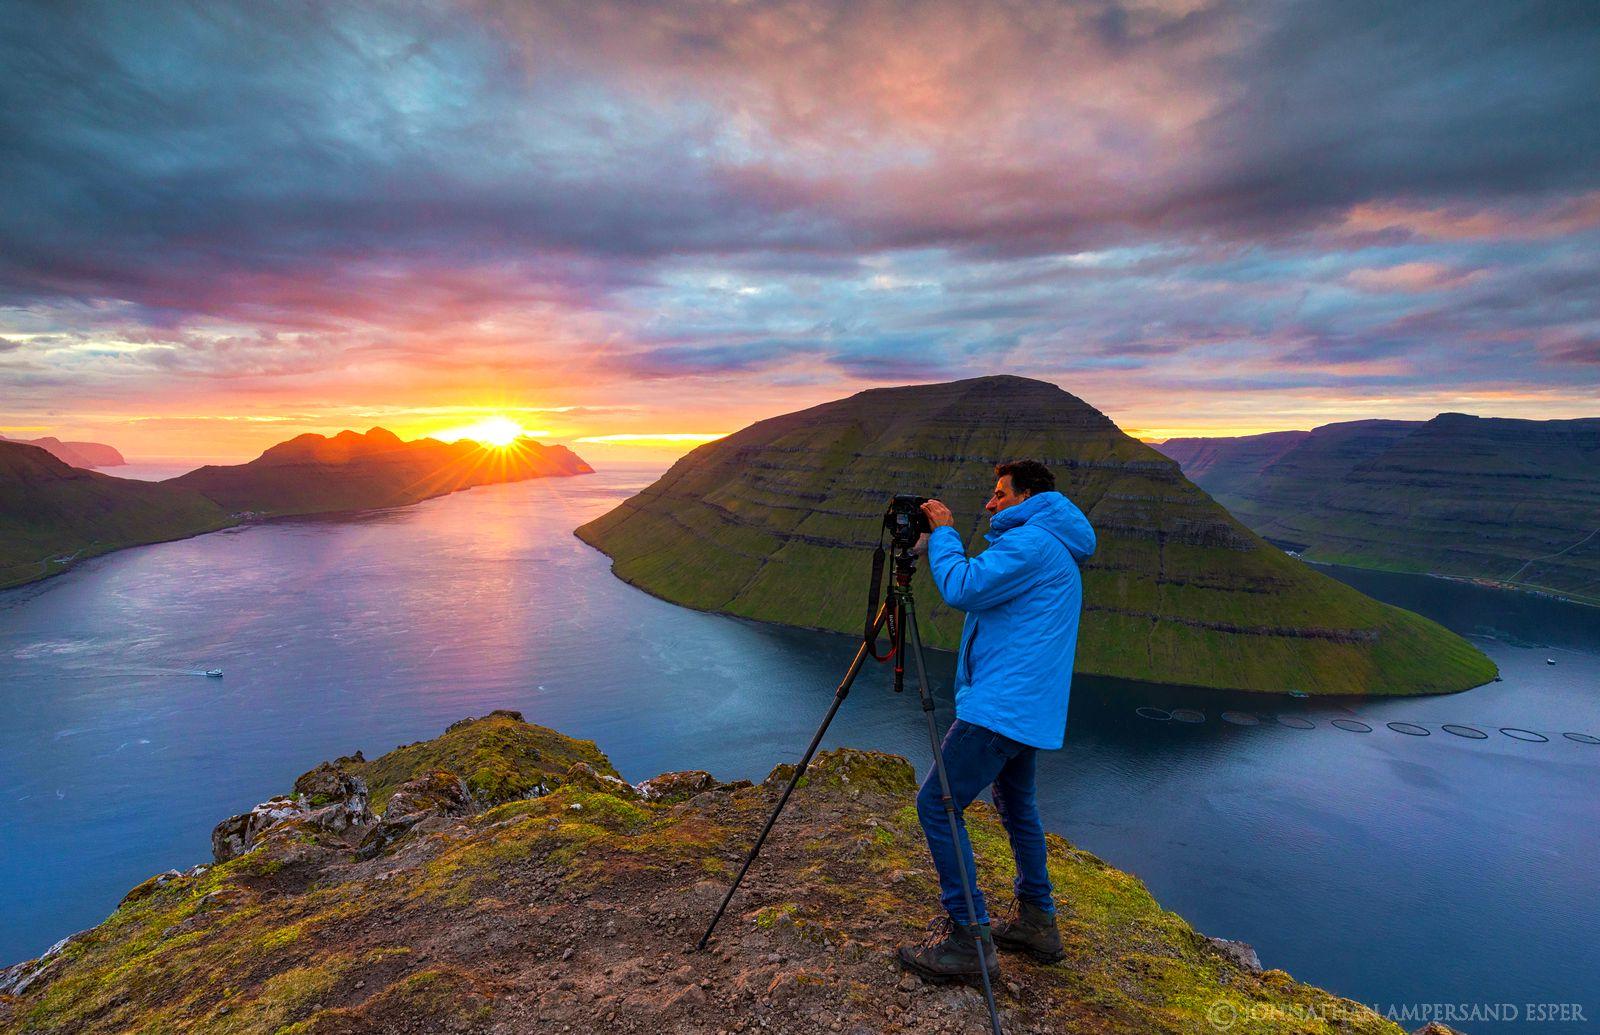 Faroe Islands,photographing,photography tour,photo tour,photo workshop,Jose Hamui,Klaksvik,